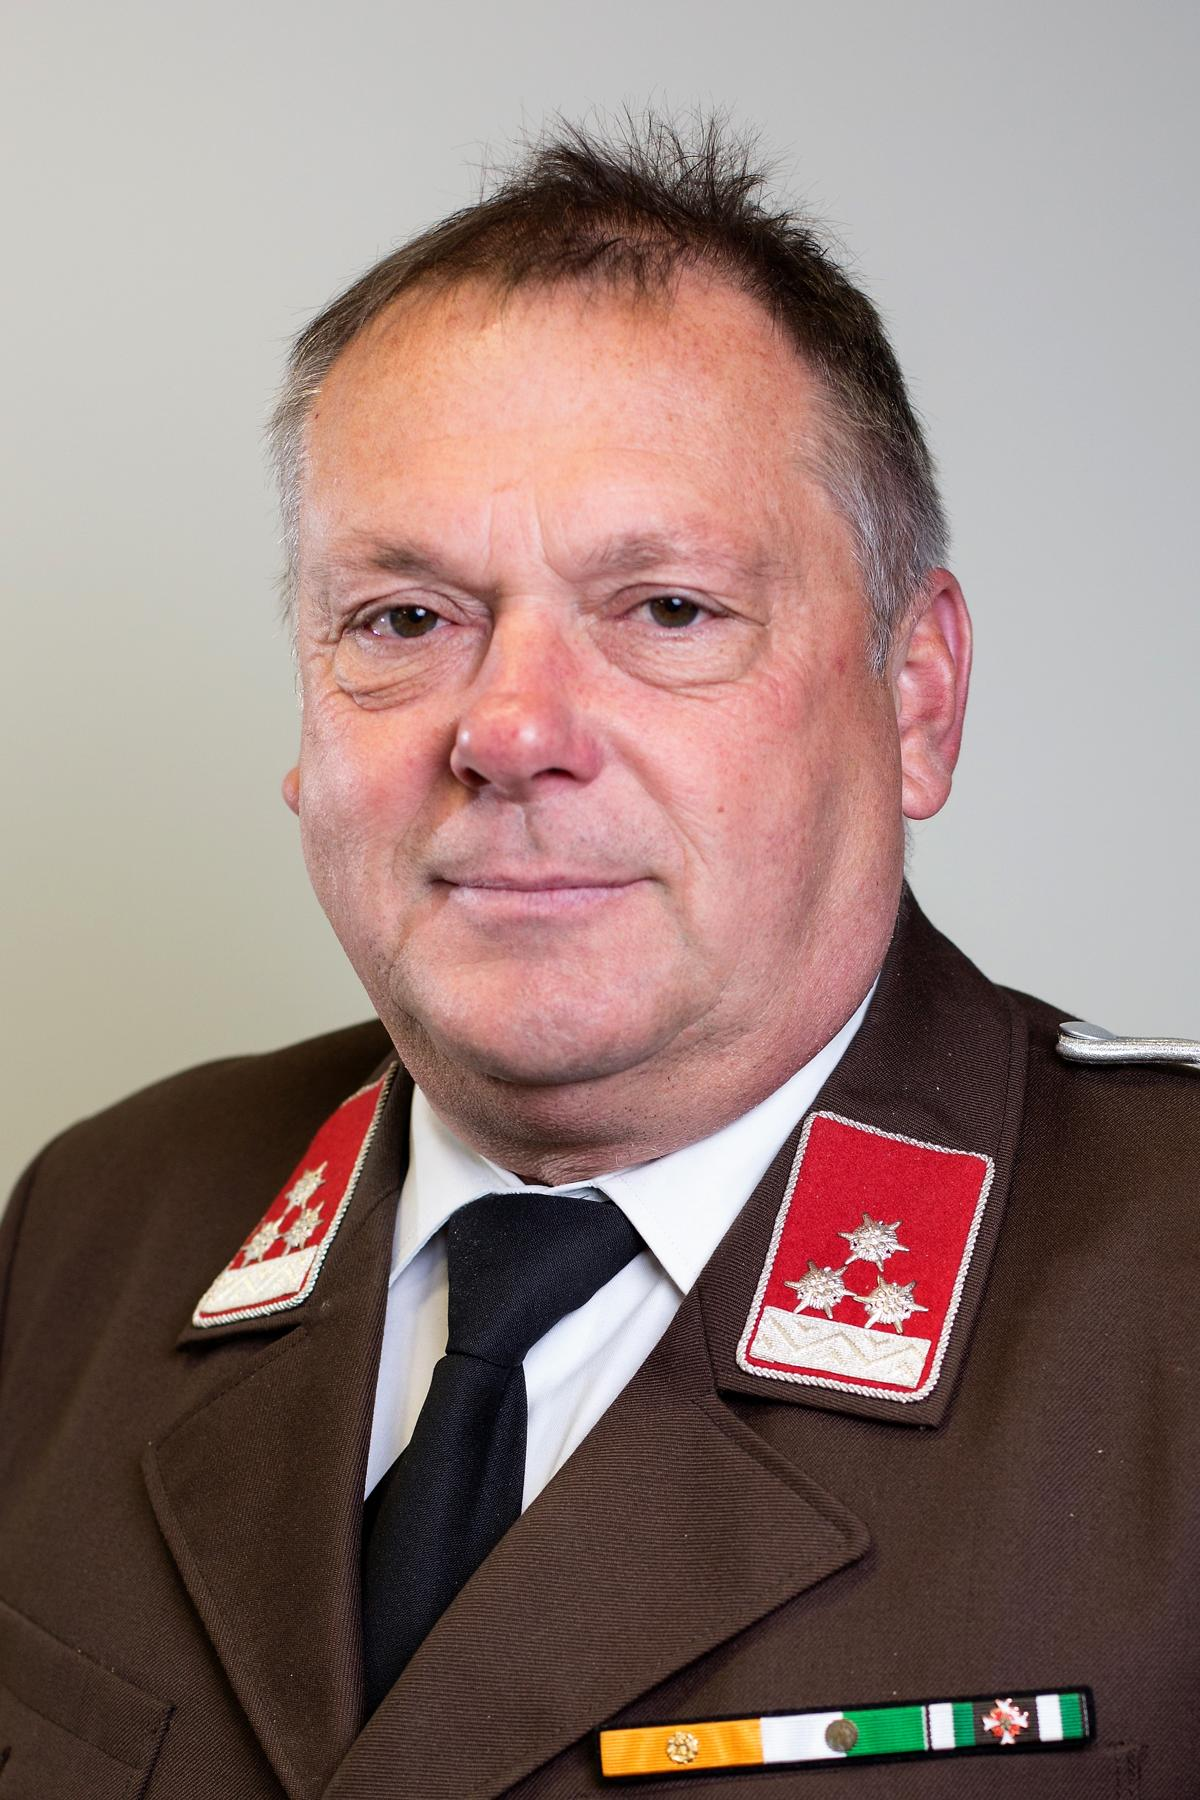 BM Herbert Nöhrer